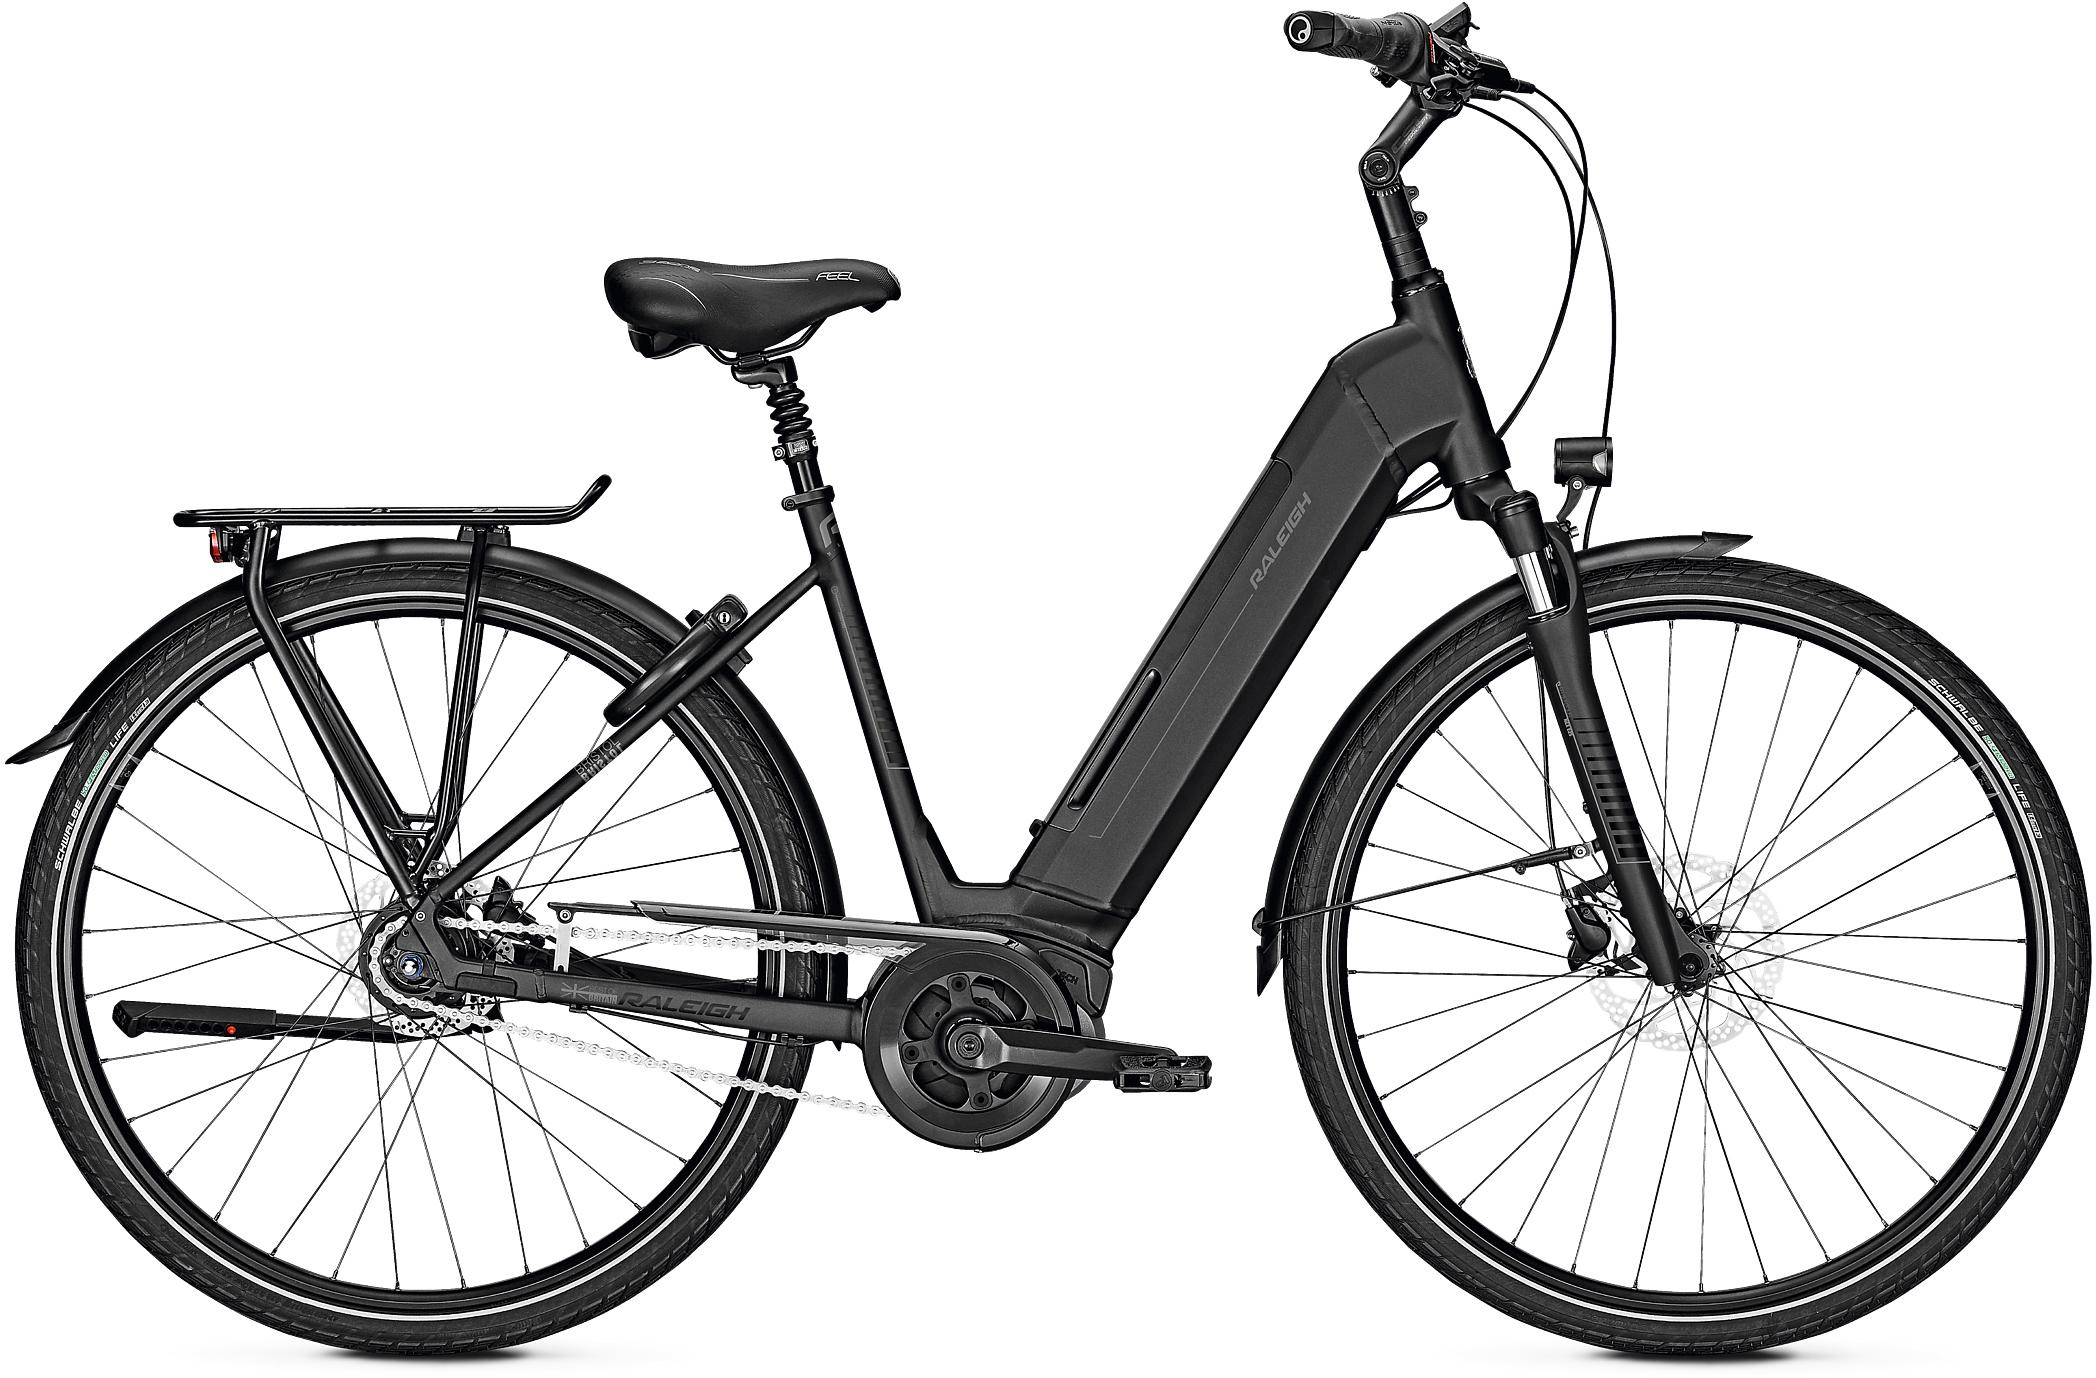 raleigh e bike boston 8 8 gang shimano nexus schaltwerk. Black Bedroom Furniture Sets. Home Design Ideas